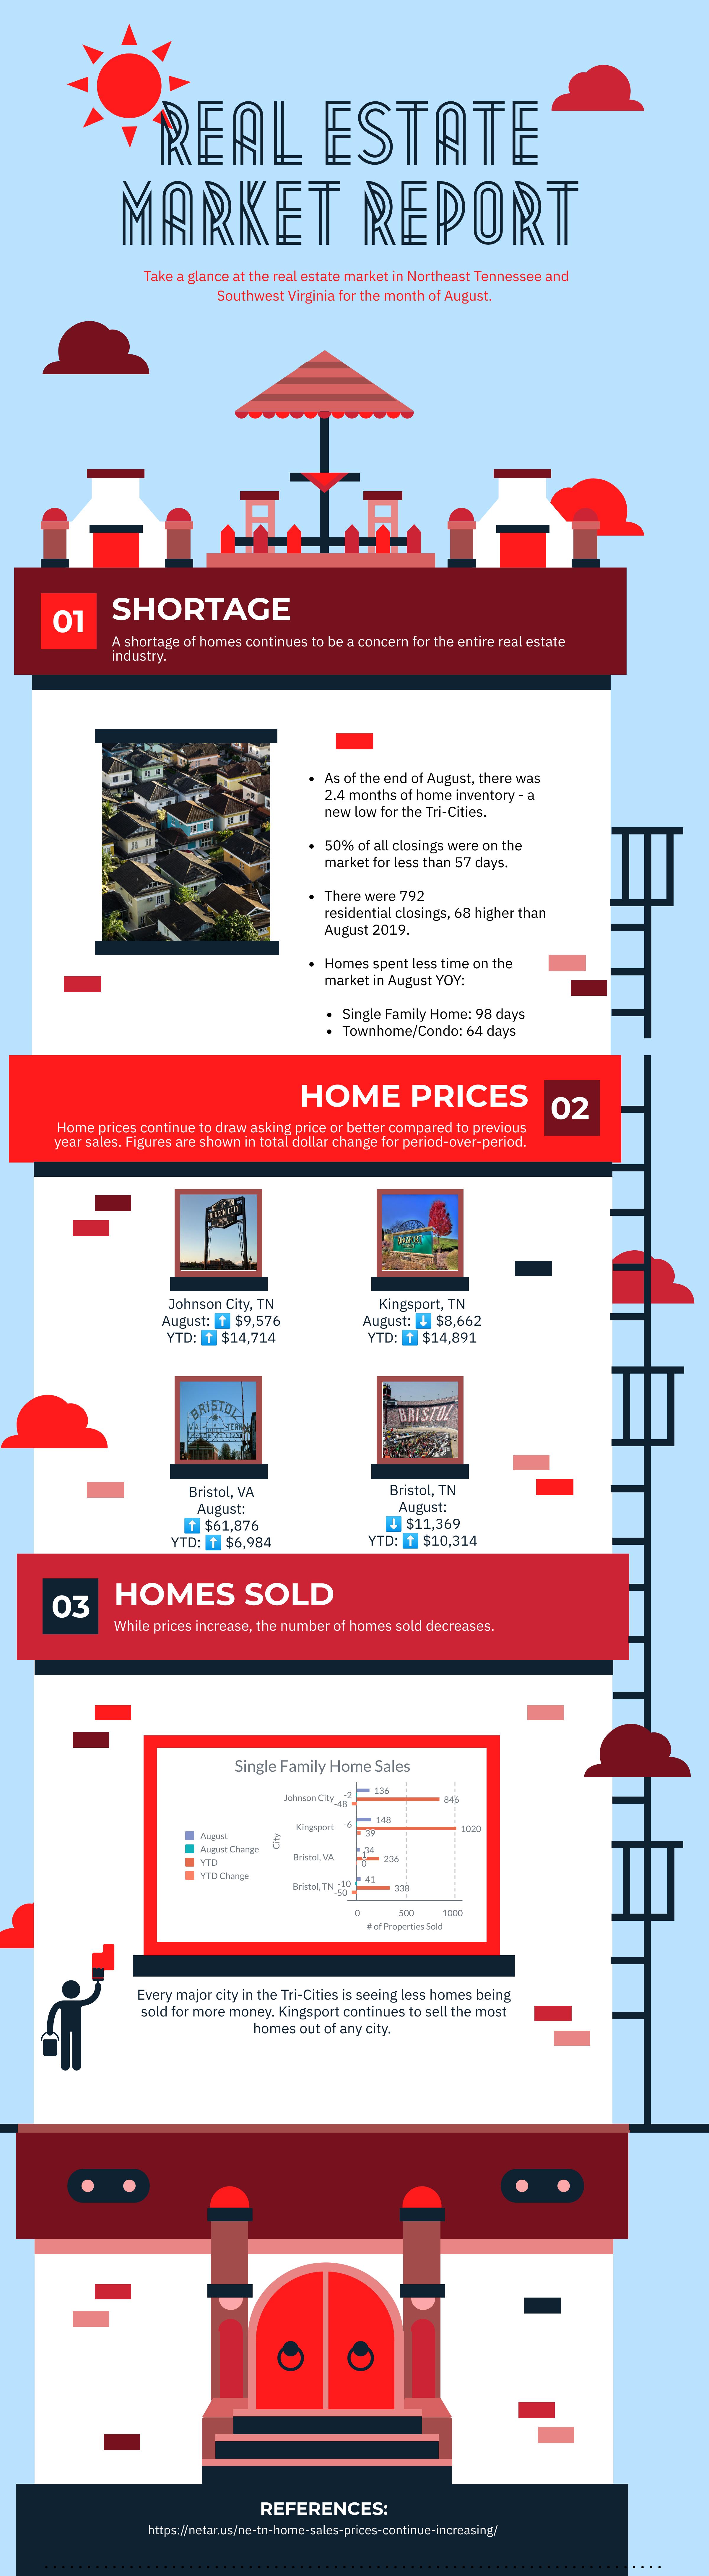 real estate market, market trends, market report, tri cities real estate, kingsport, bristol, johnson city, red door agency, northeast tennessee, southwest virginia